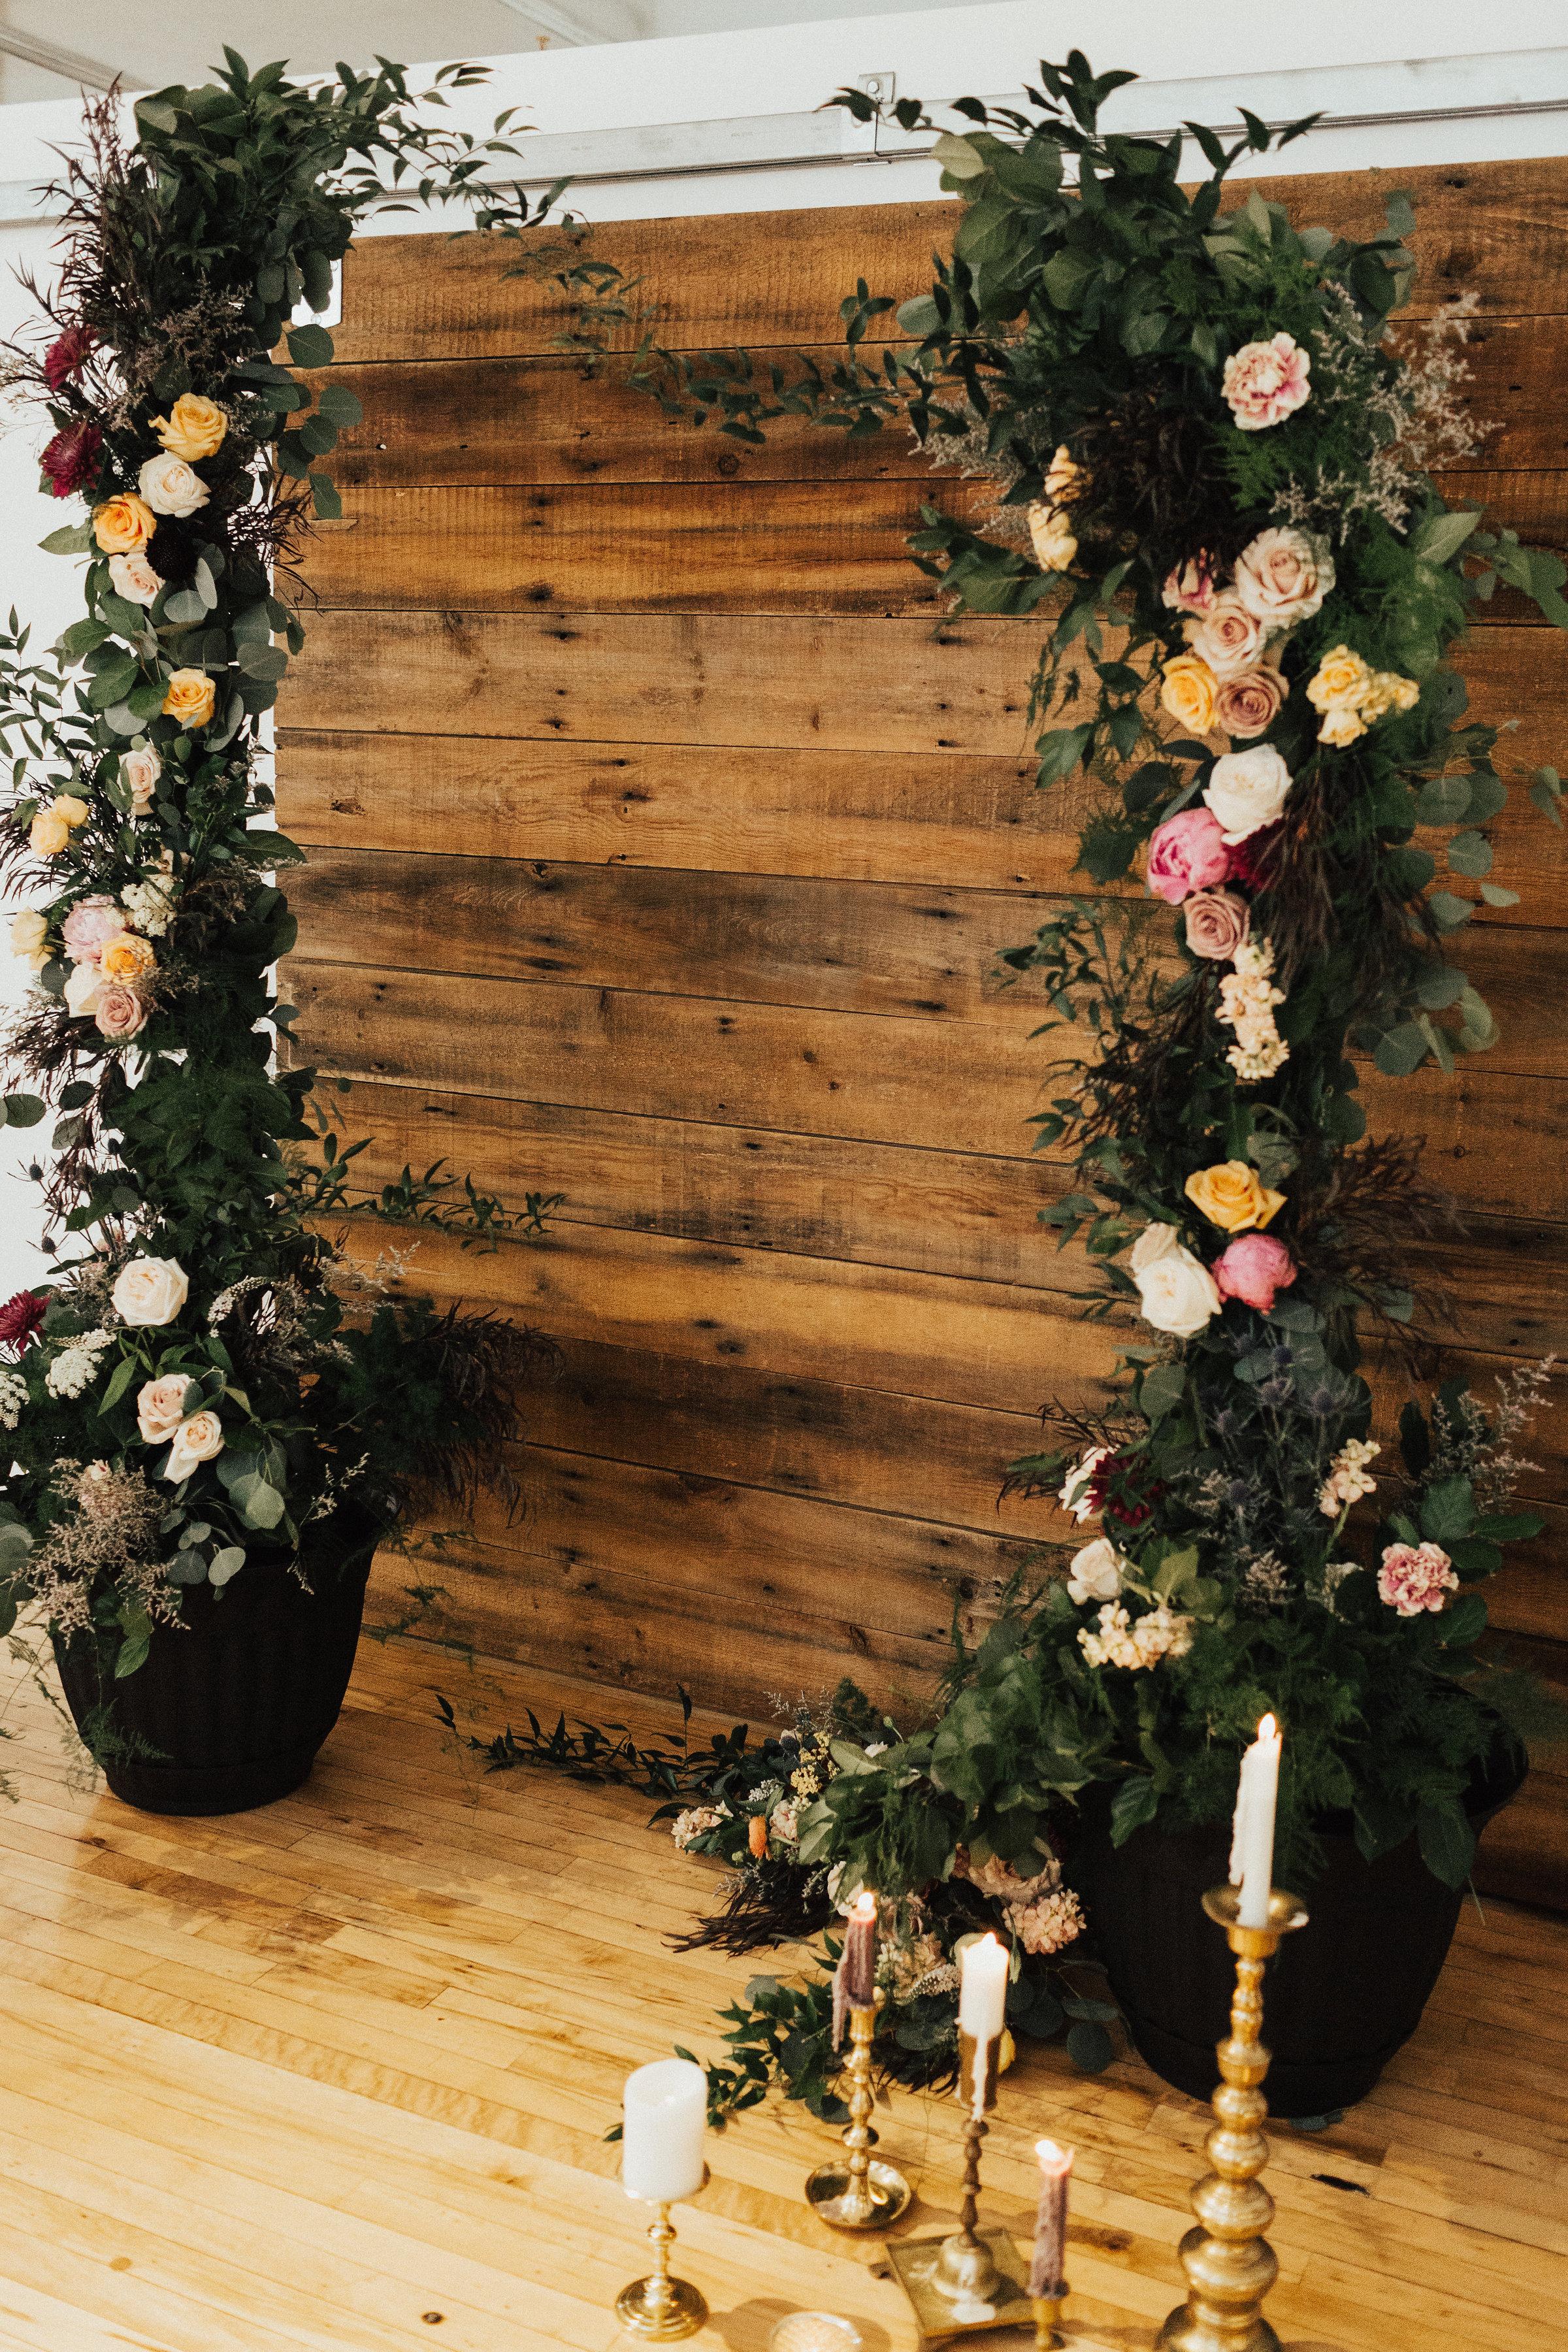 kcmo wedding arches arbors heart + soul kc florist kc wedding florist